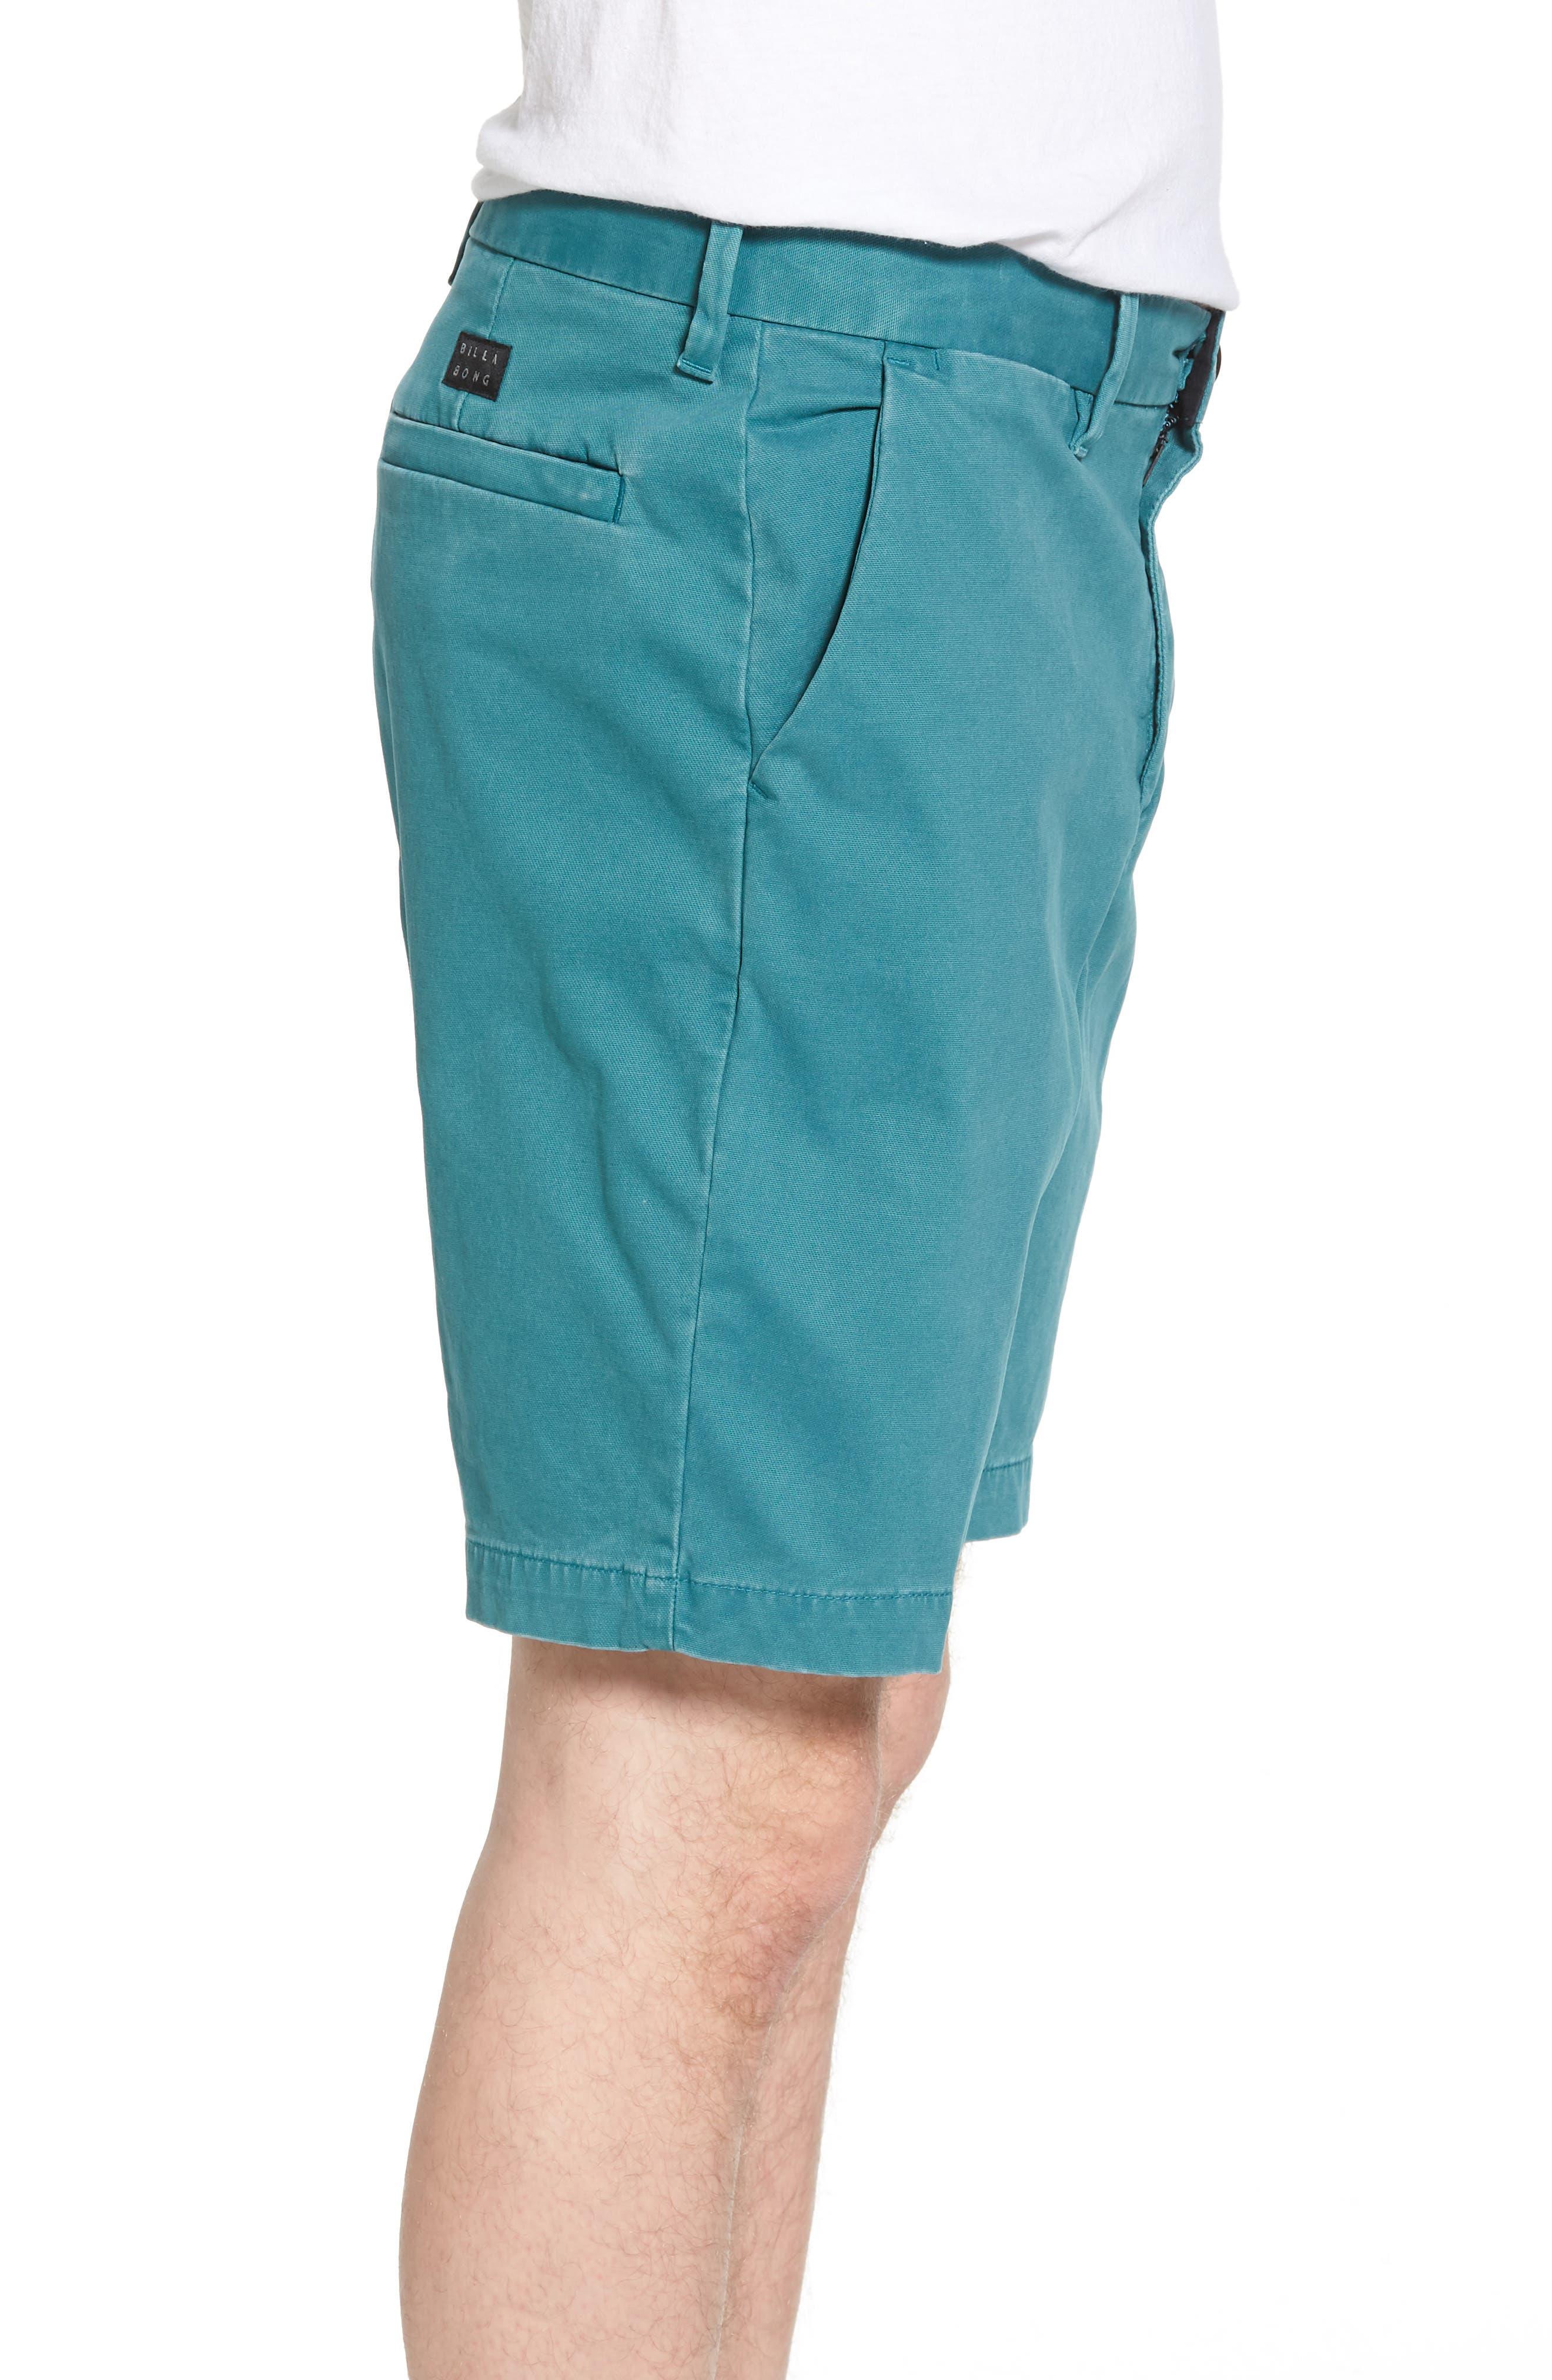 New Order Shorts,                             Alternate thumbnail 3, color,                             Hydro